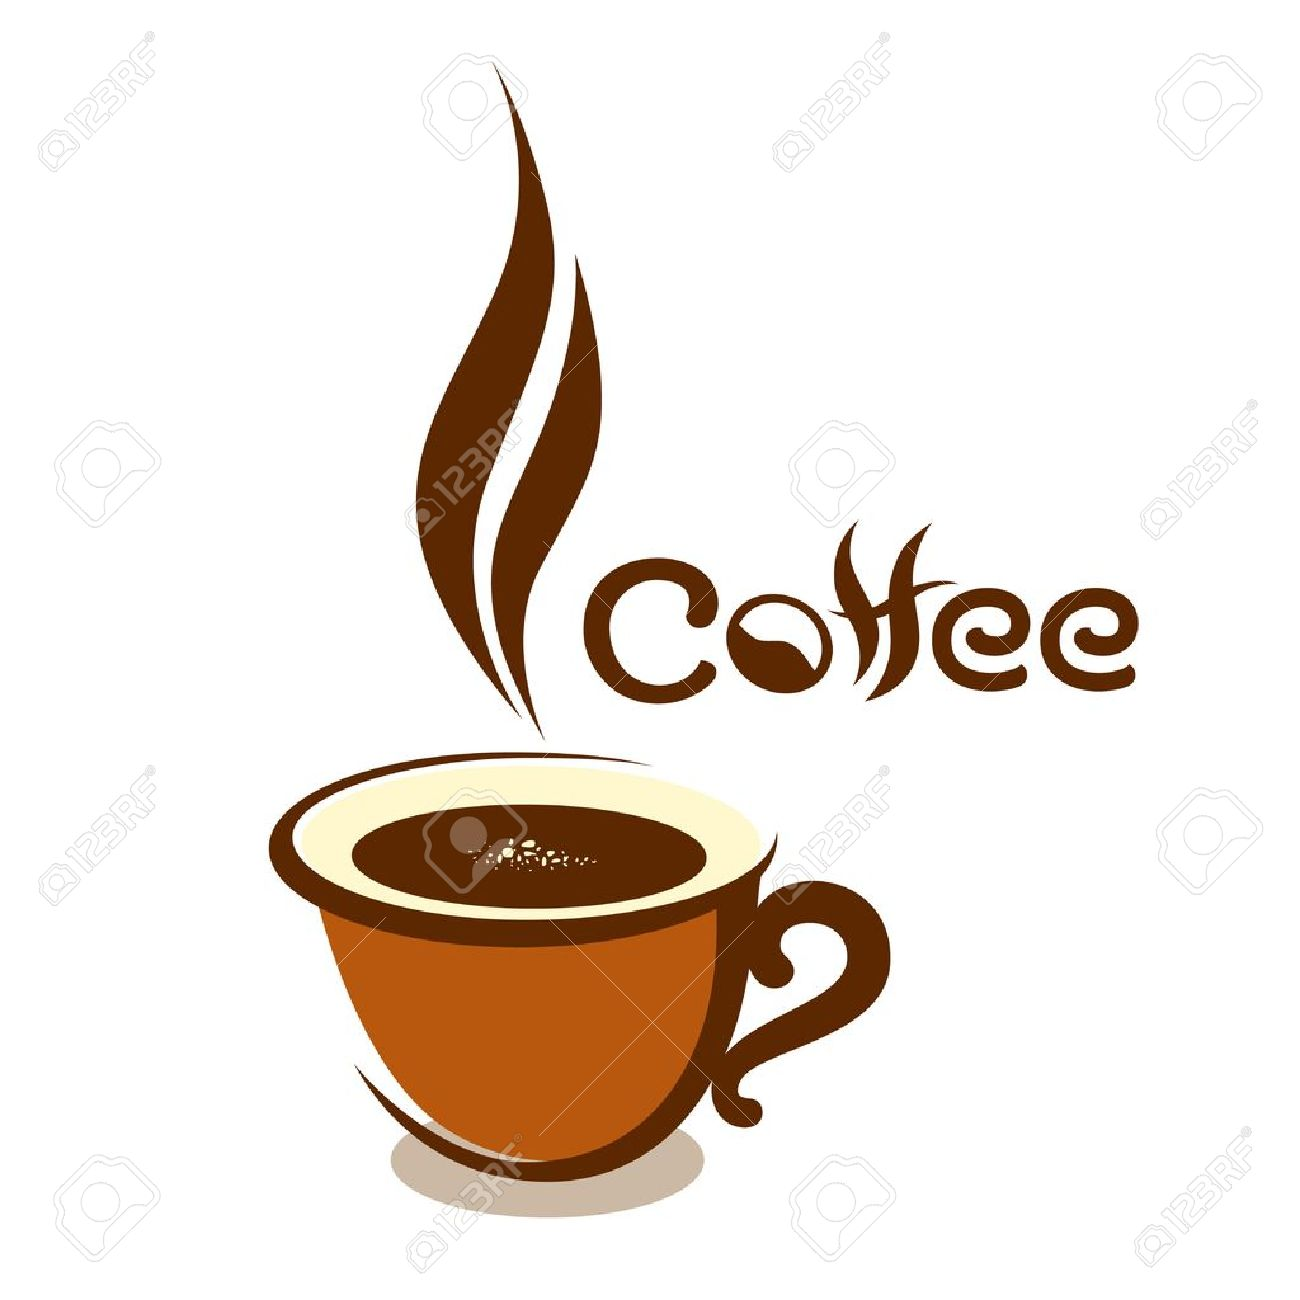 Coffee cup vector free - Coffee Cup Design Vector Illustration Stock Vector 14615682